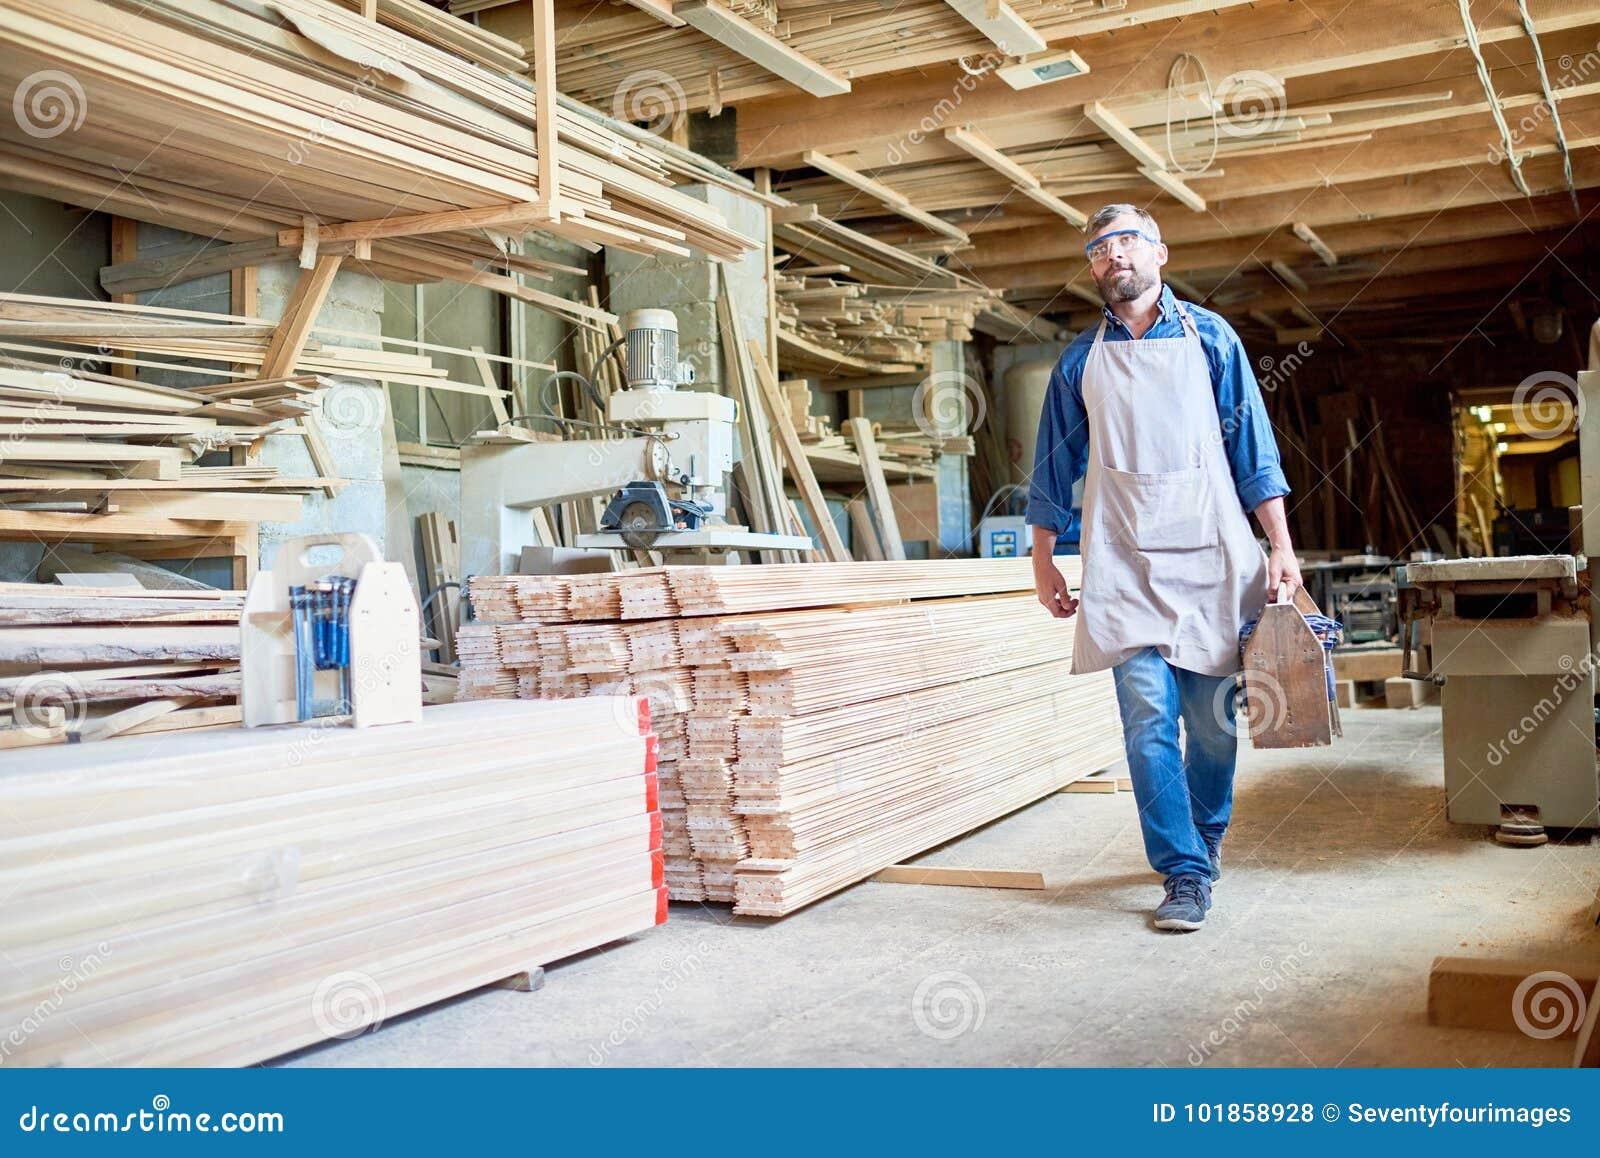 Carpenter in Modern Joinery